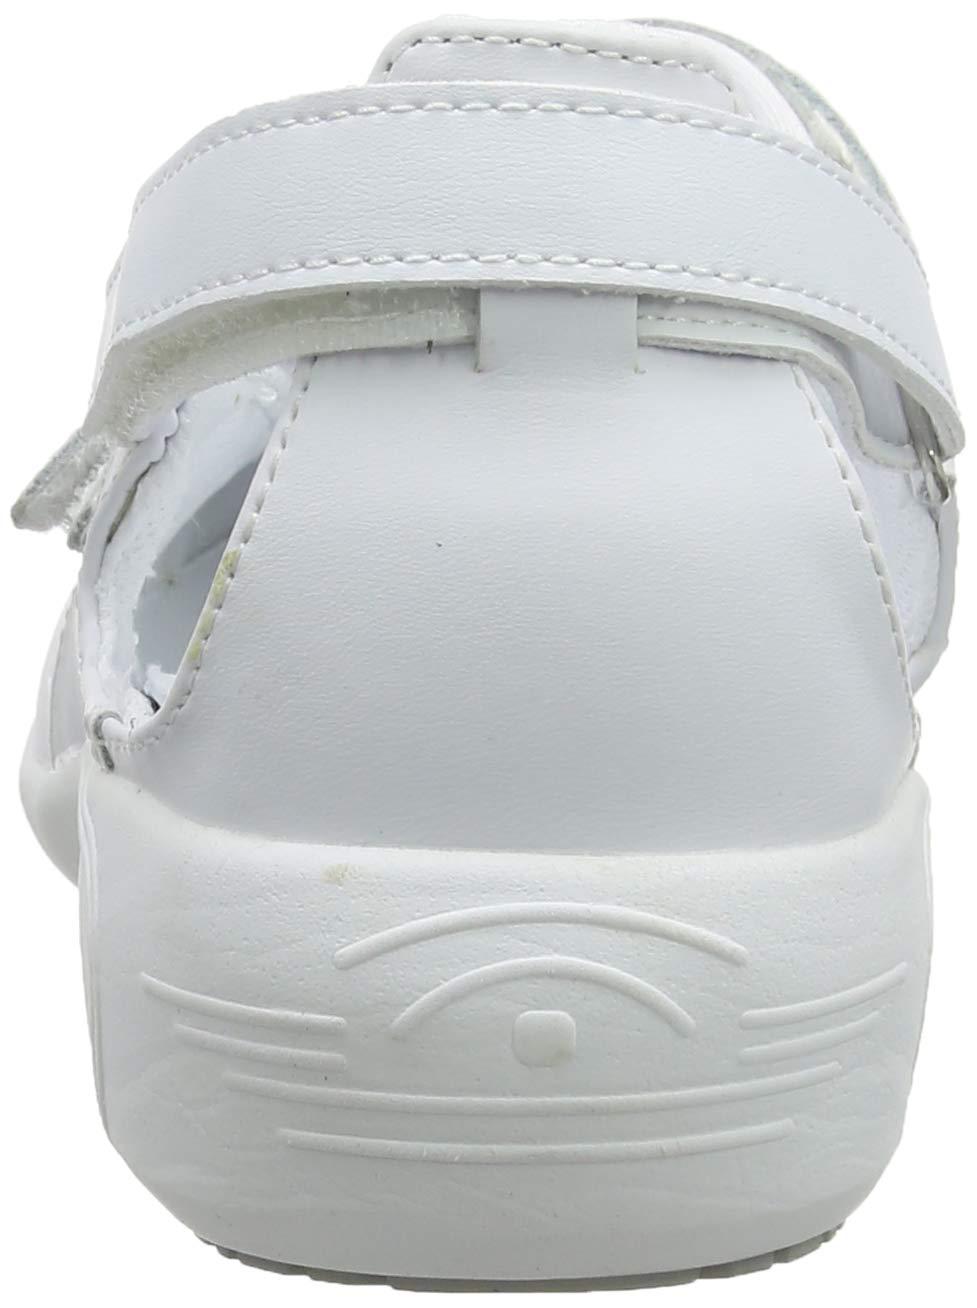 White//Fuchsia Fuchsia Oxypas Move Up Salma Slip-resistant 4 UK 37 EU Antistatic Nursing Shoes